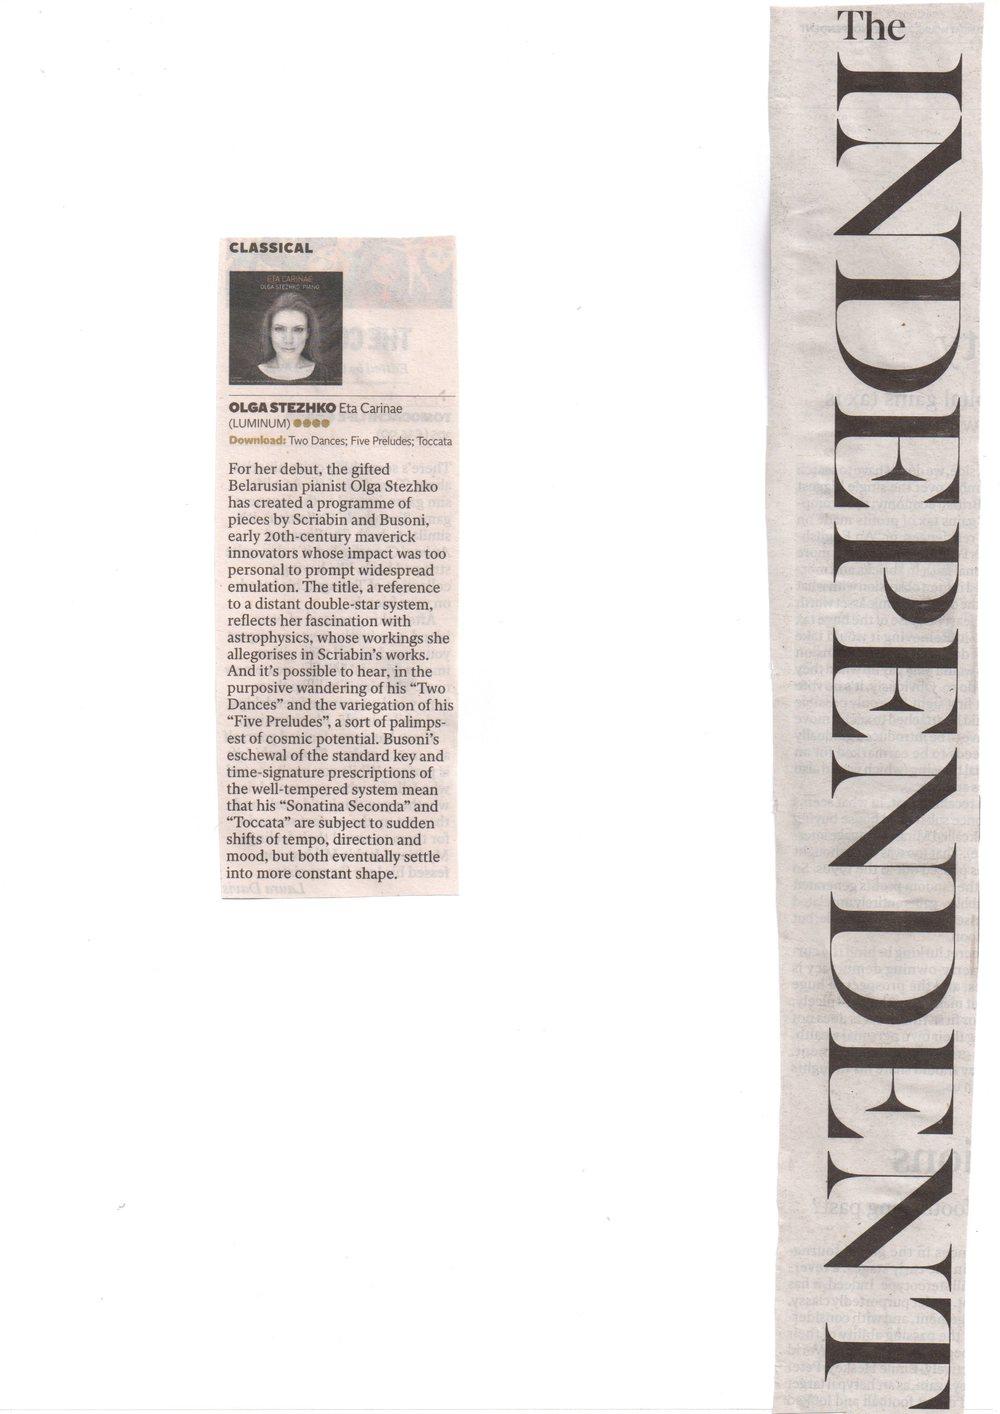 The Independent 4 star review for Olga Stezhko's album Eta Carinae